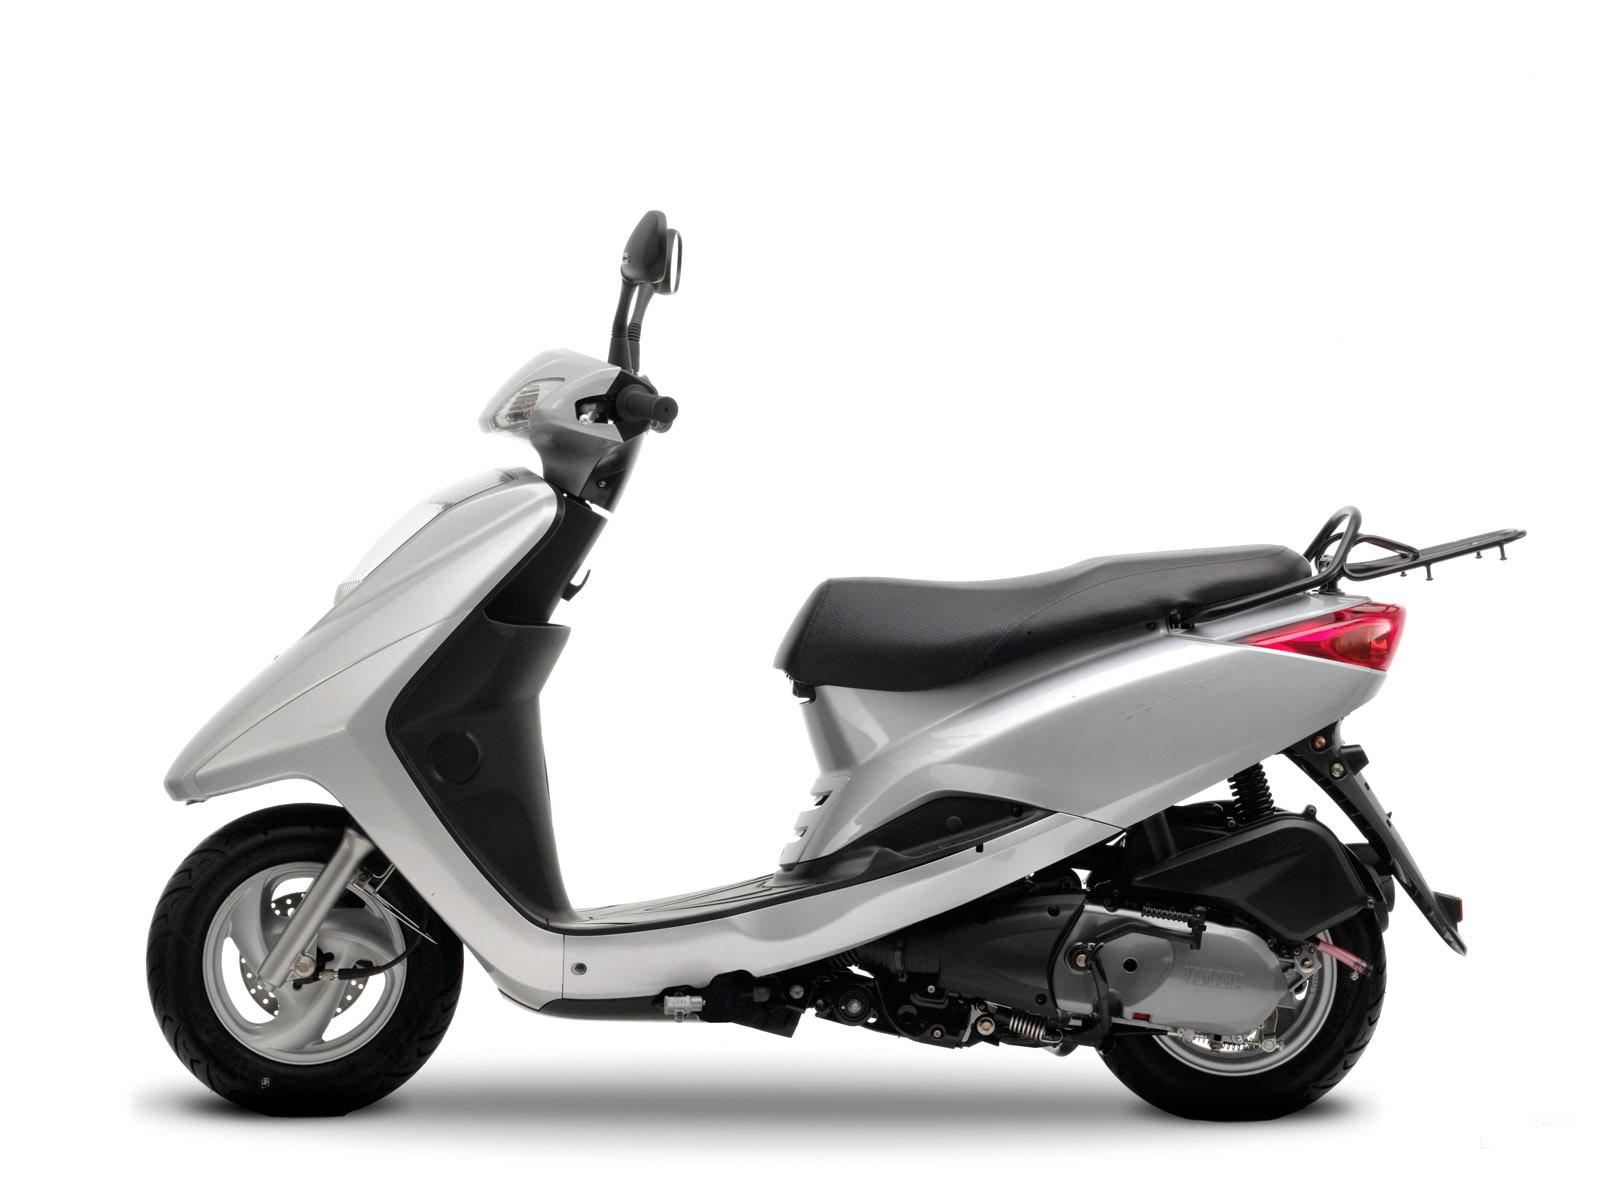 examen de moto: